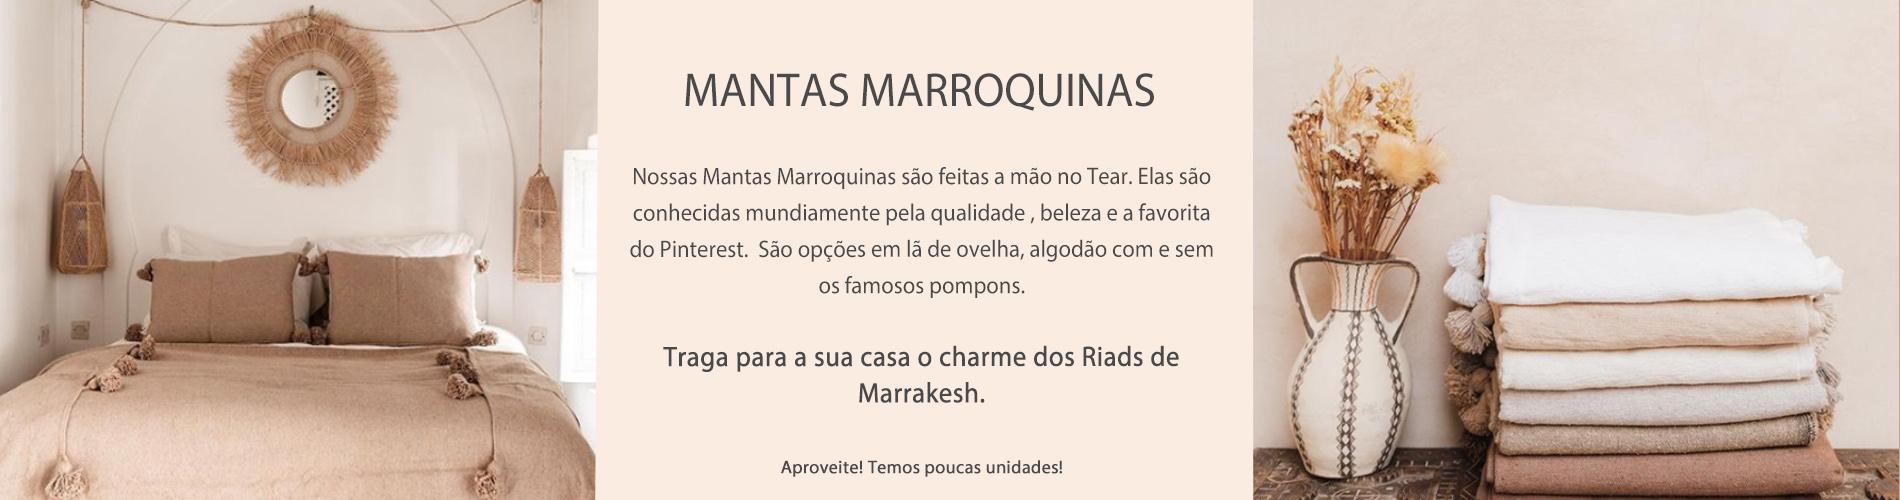 Mantas de Marrakesh página de produtos